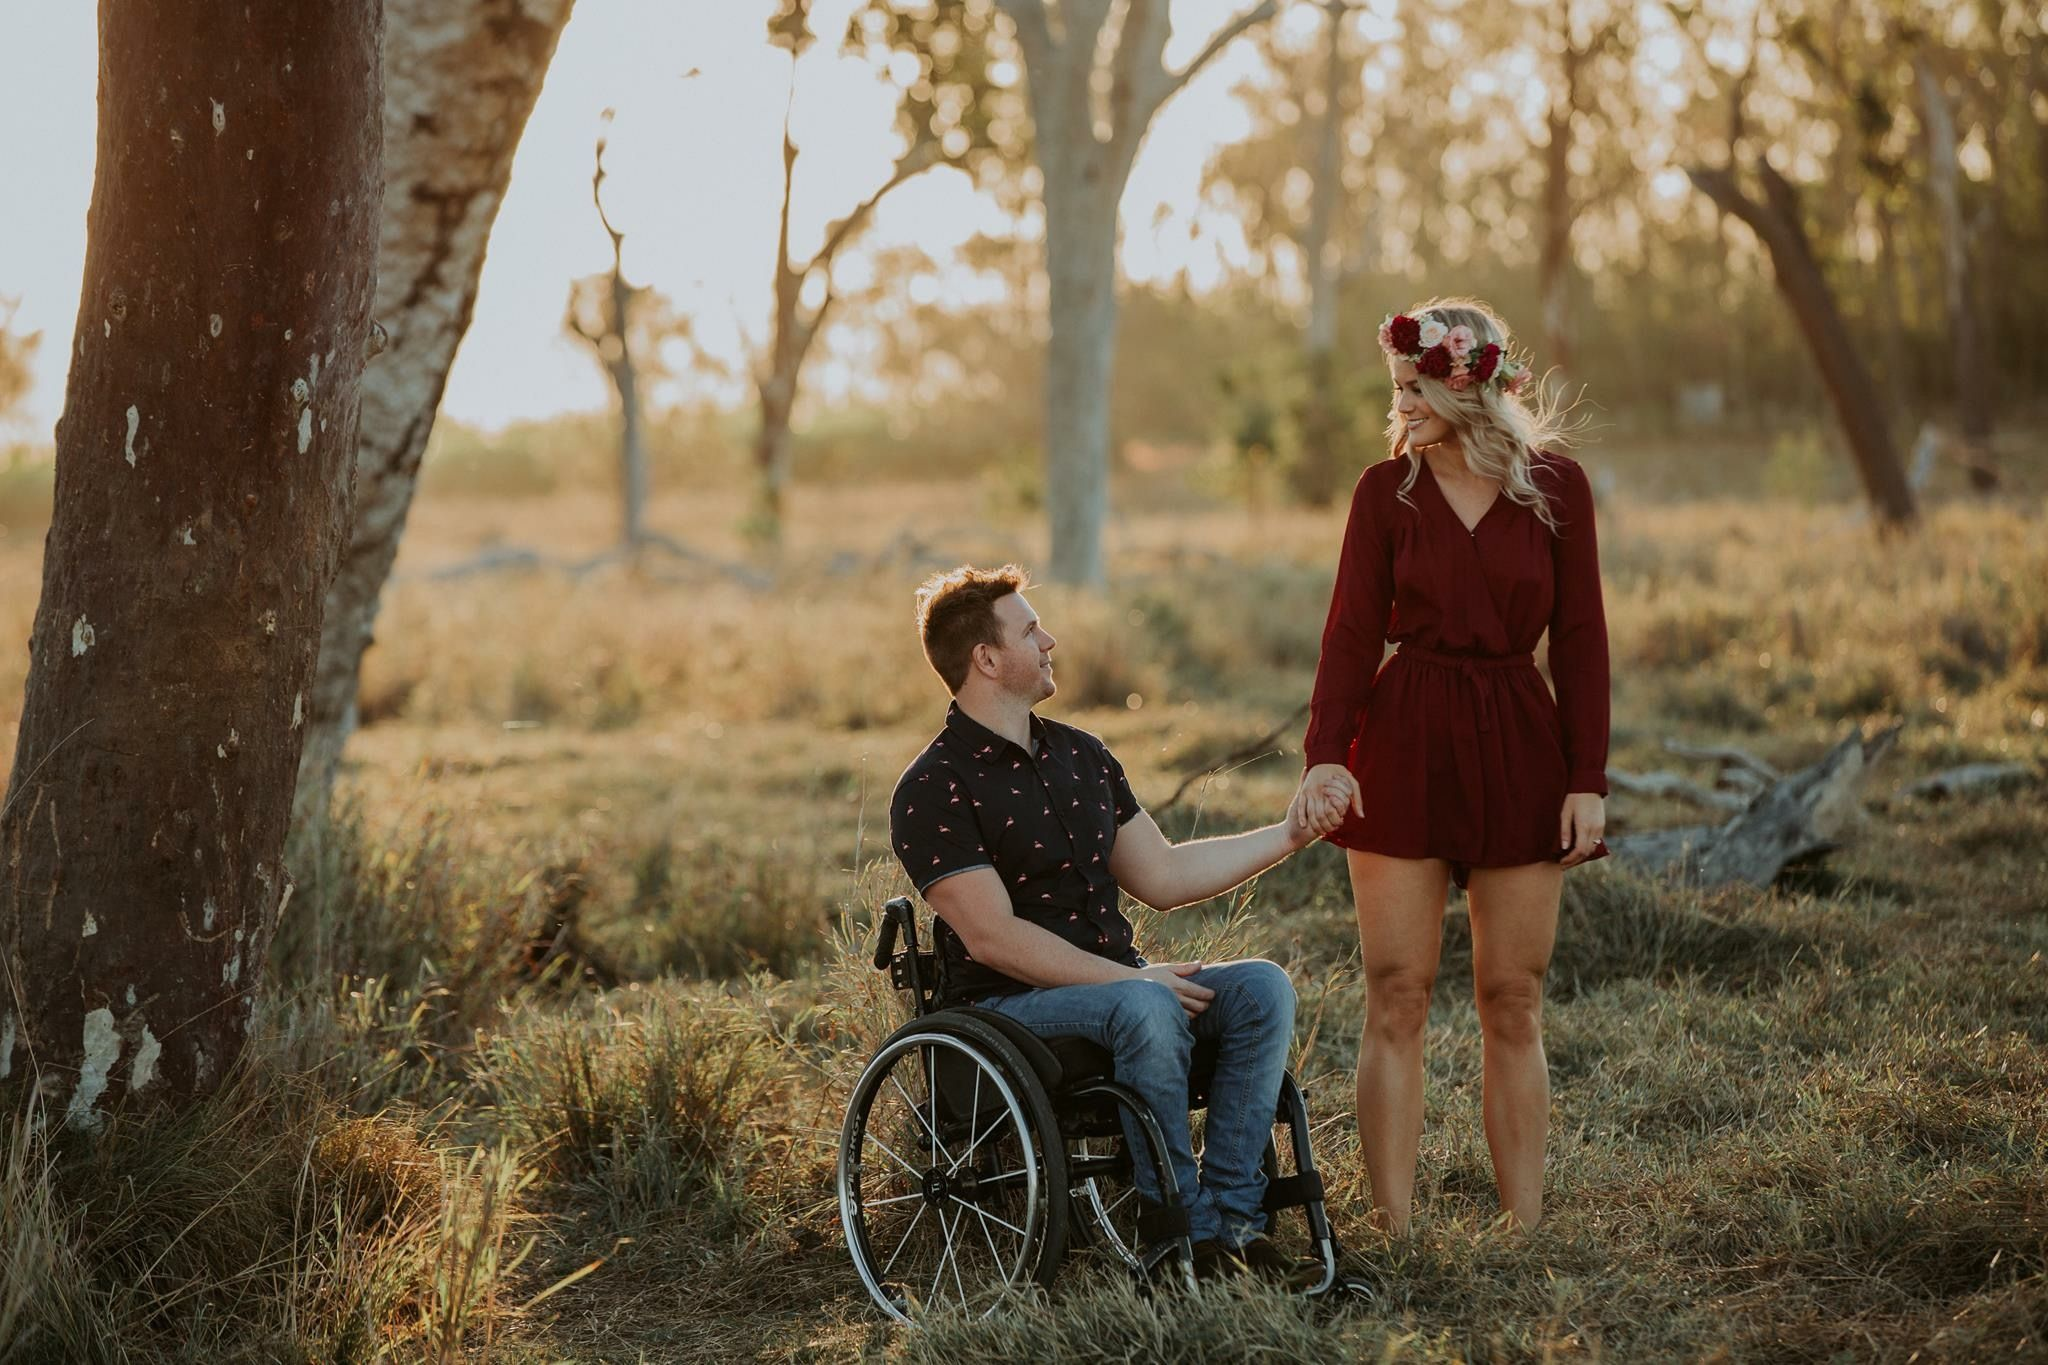 #love #summerrainphotography #lovehasnolimits #engagementshoot #wheelchair